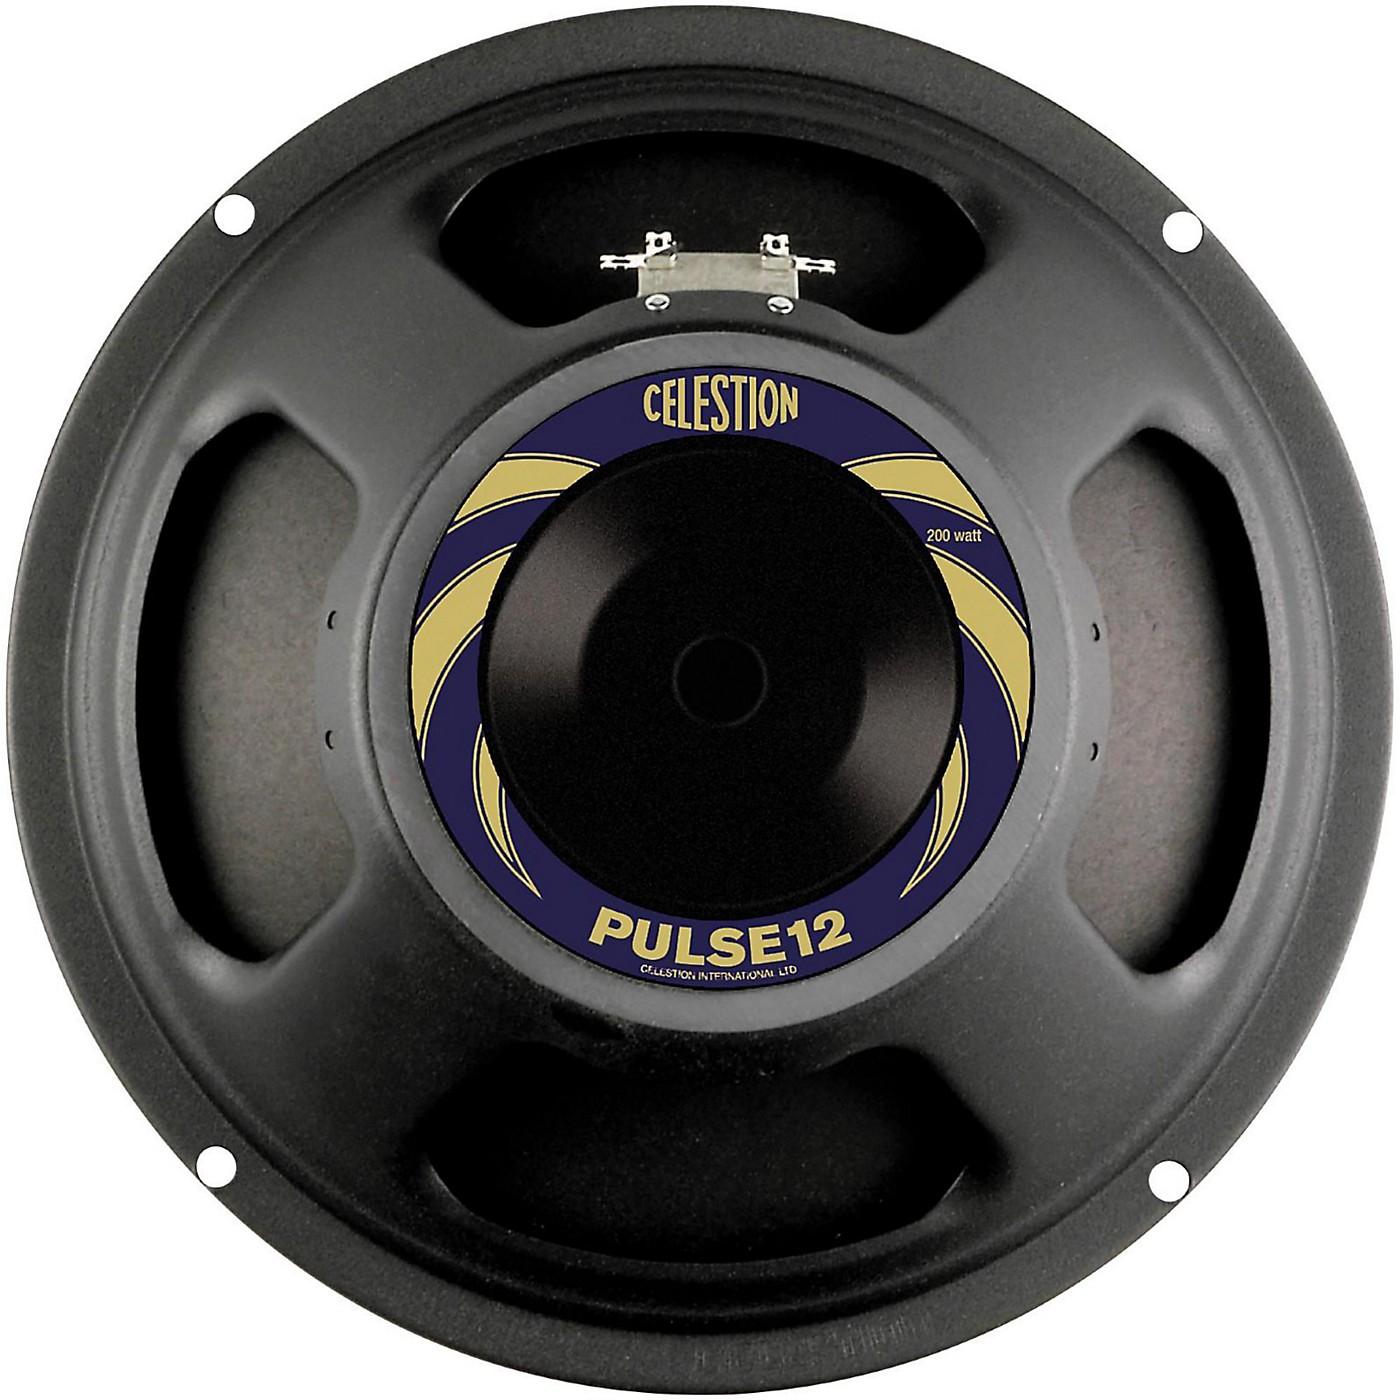 Celestion Pulse Series 12 Inch 200 Watt 8 ohm Ceramic Bass Replacement Speaker thumbnail